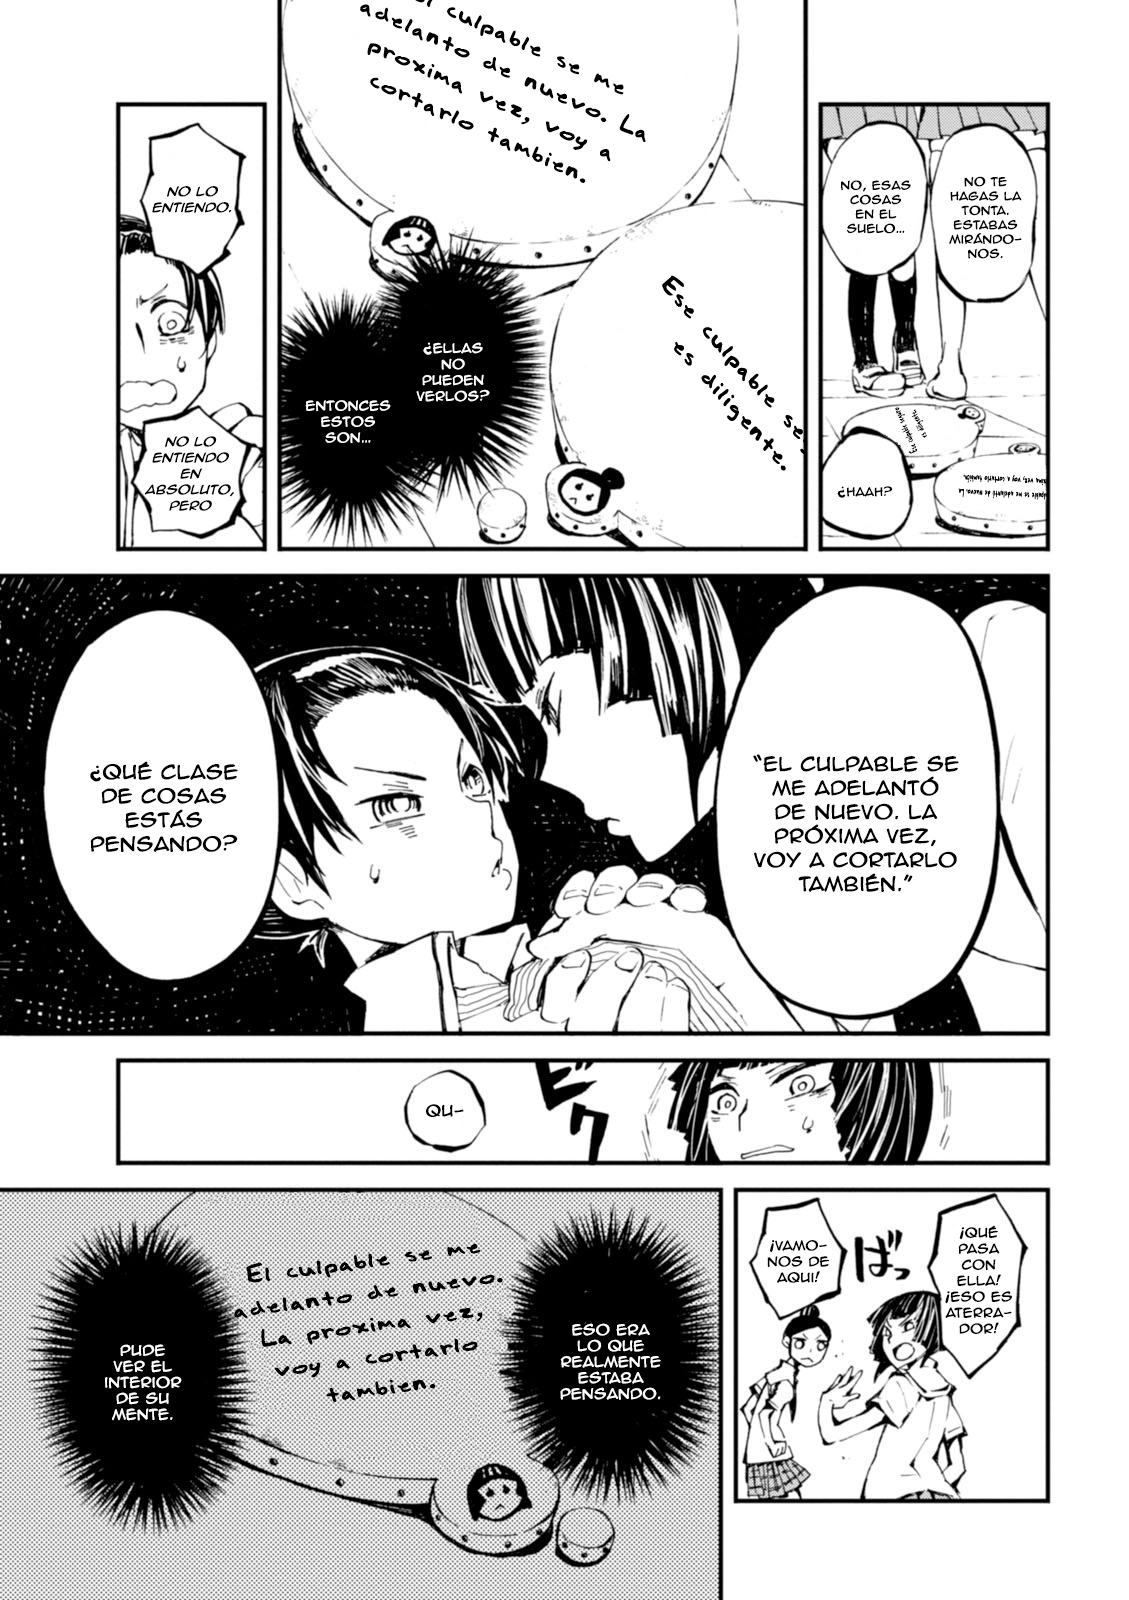 http://c5.ninemanga.com/es_manga/27/17755/453358/0d2b2061826a5df3221116a5085a6052.jpg Page 16